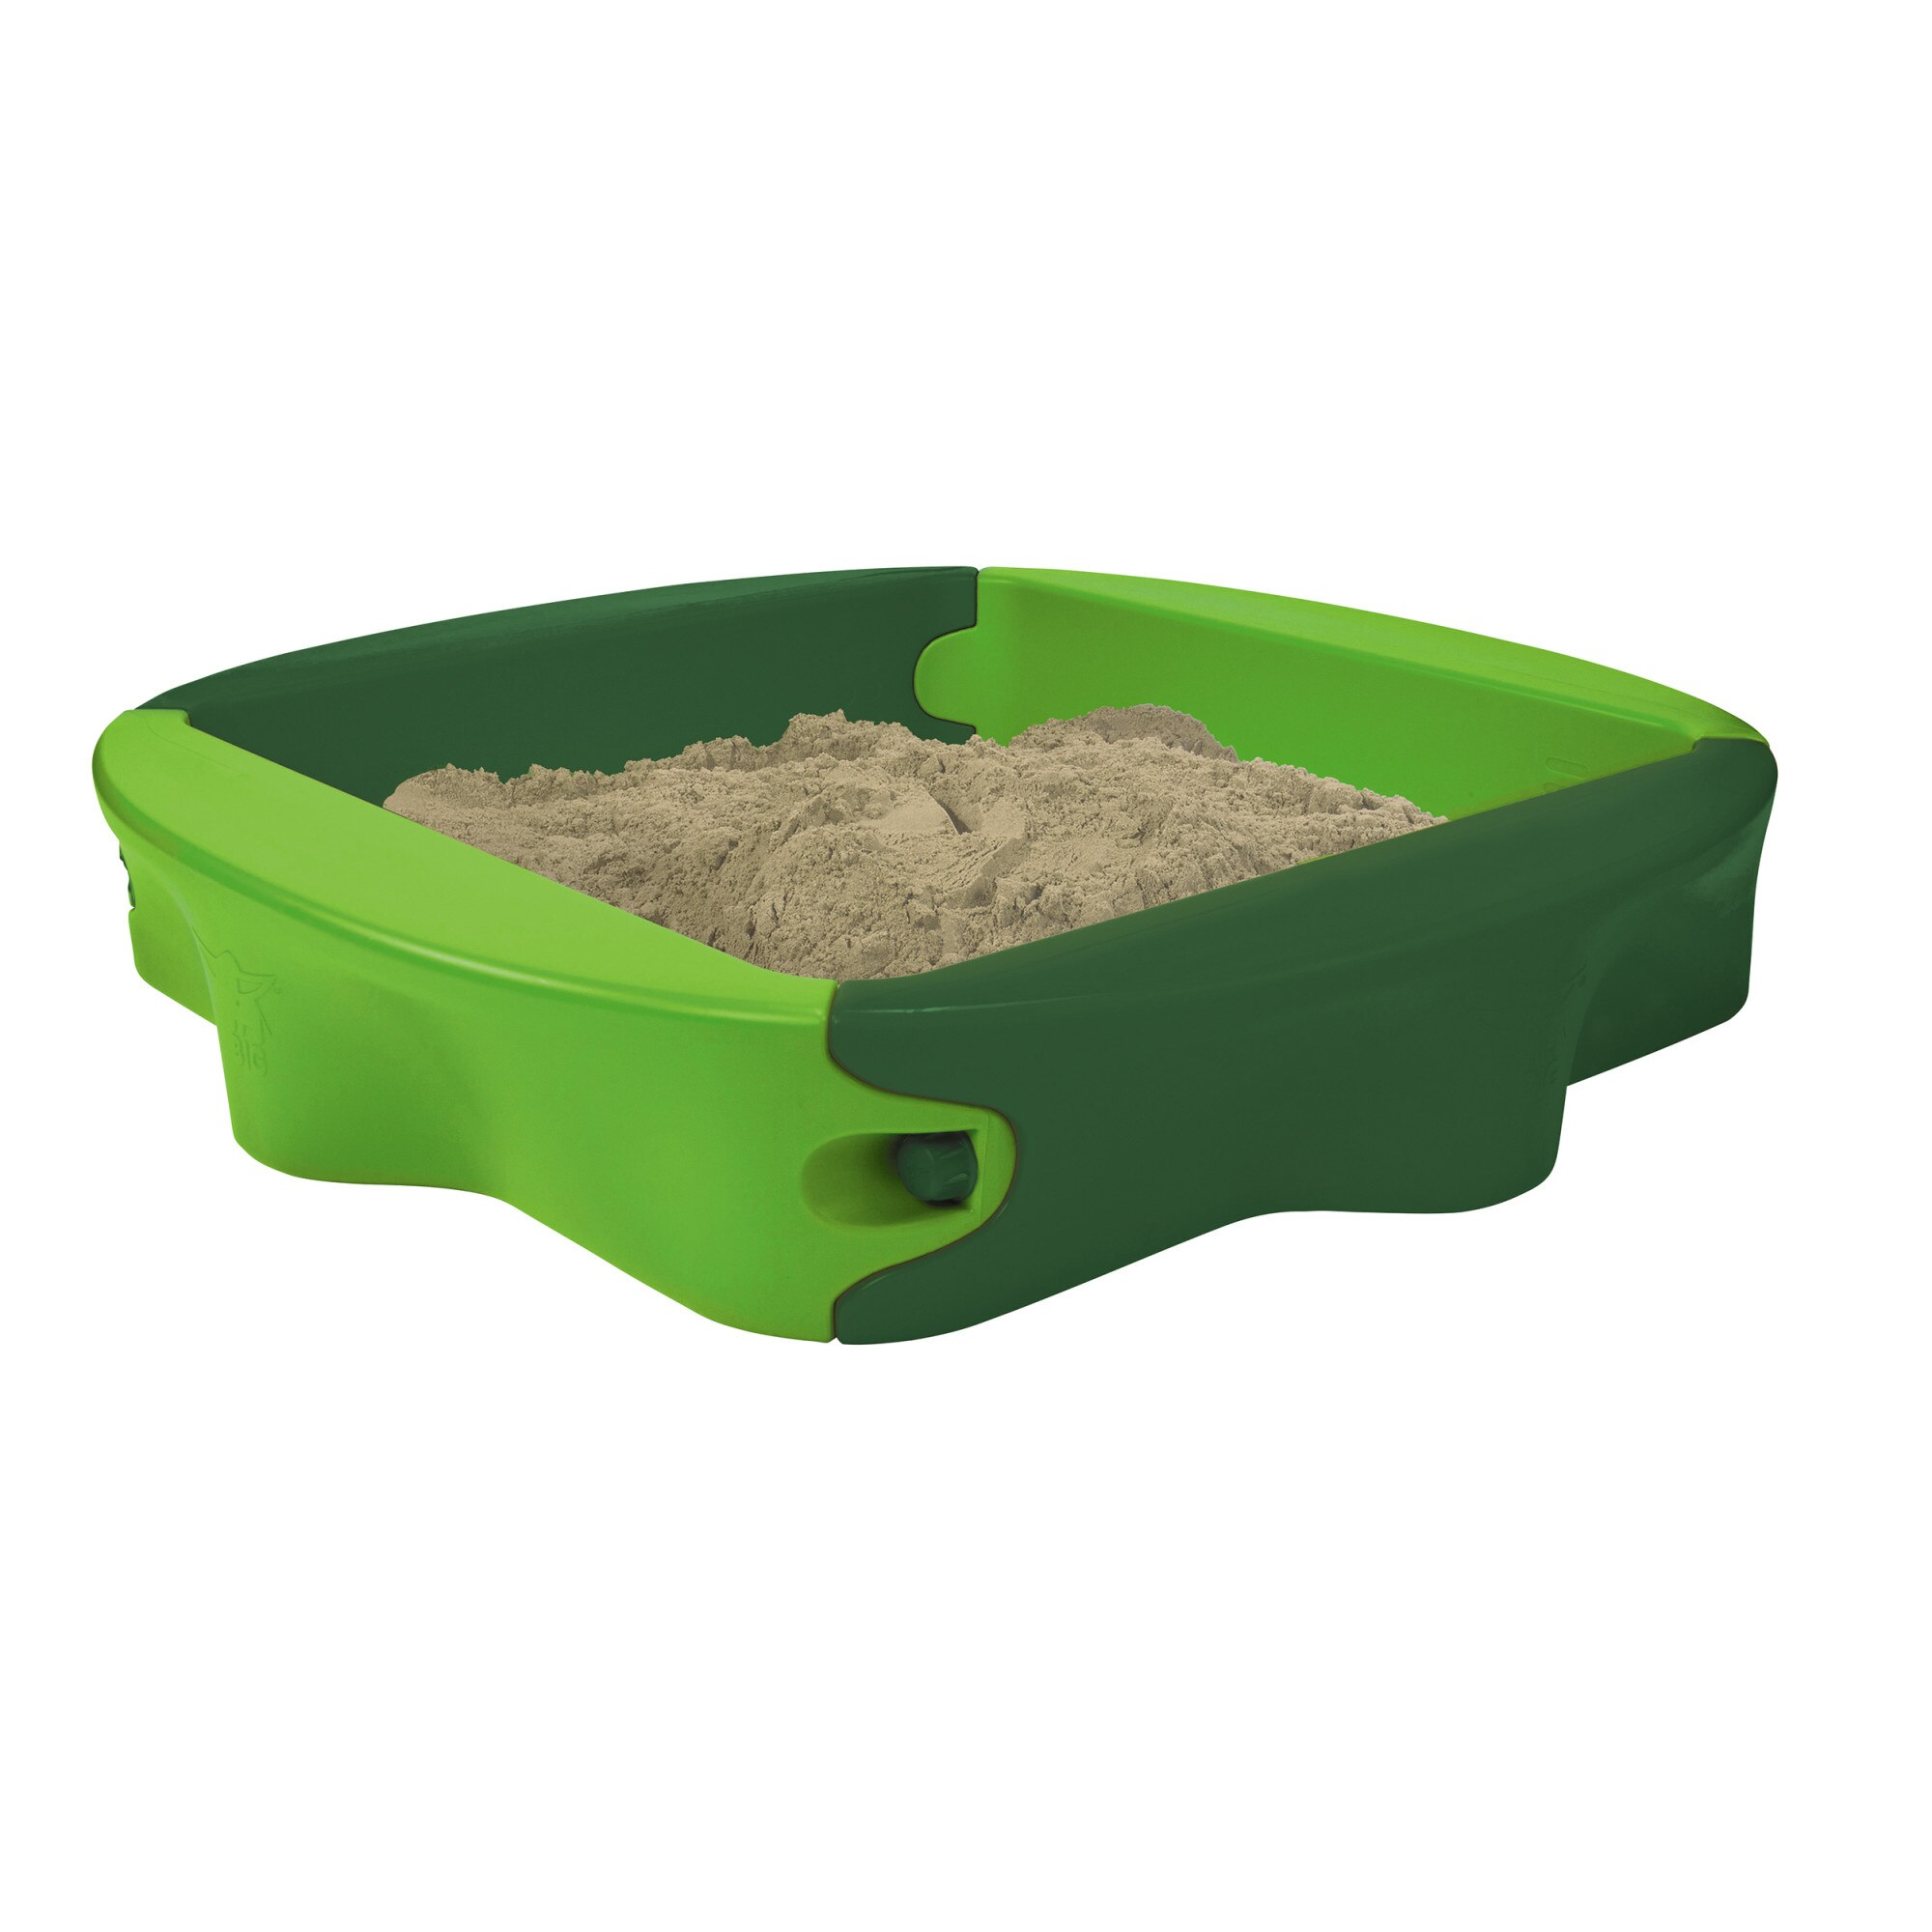 Fotografie Cutie pentru nisip Big - Sandy, cu capac, Verde, 138 x 138 x 24 cm